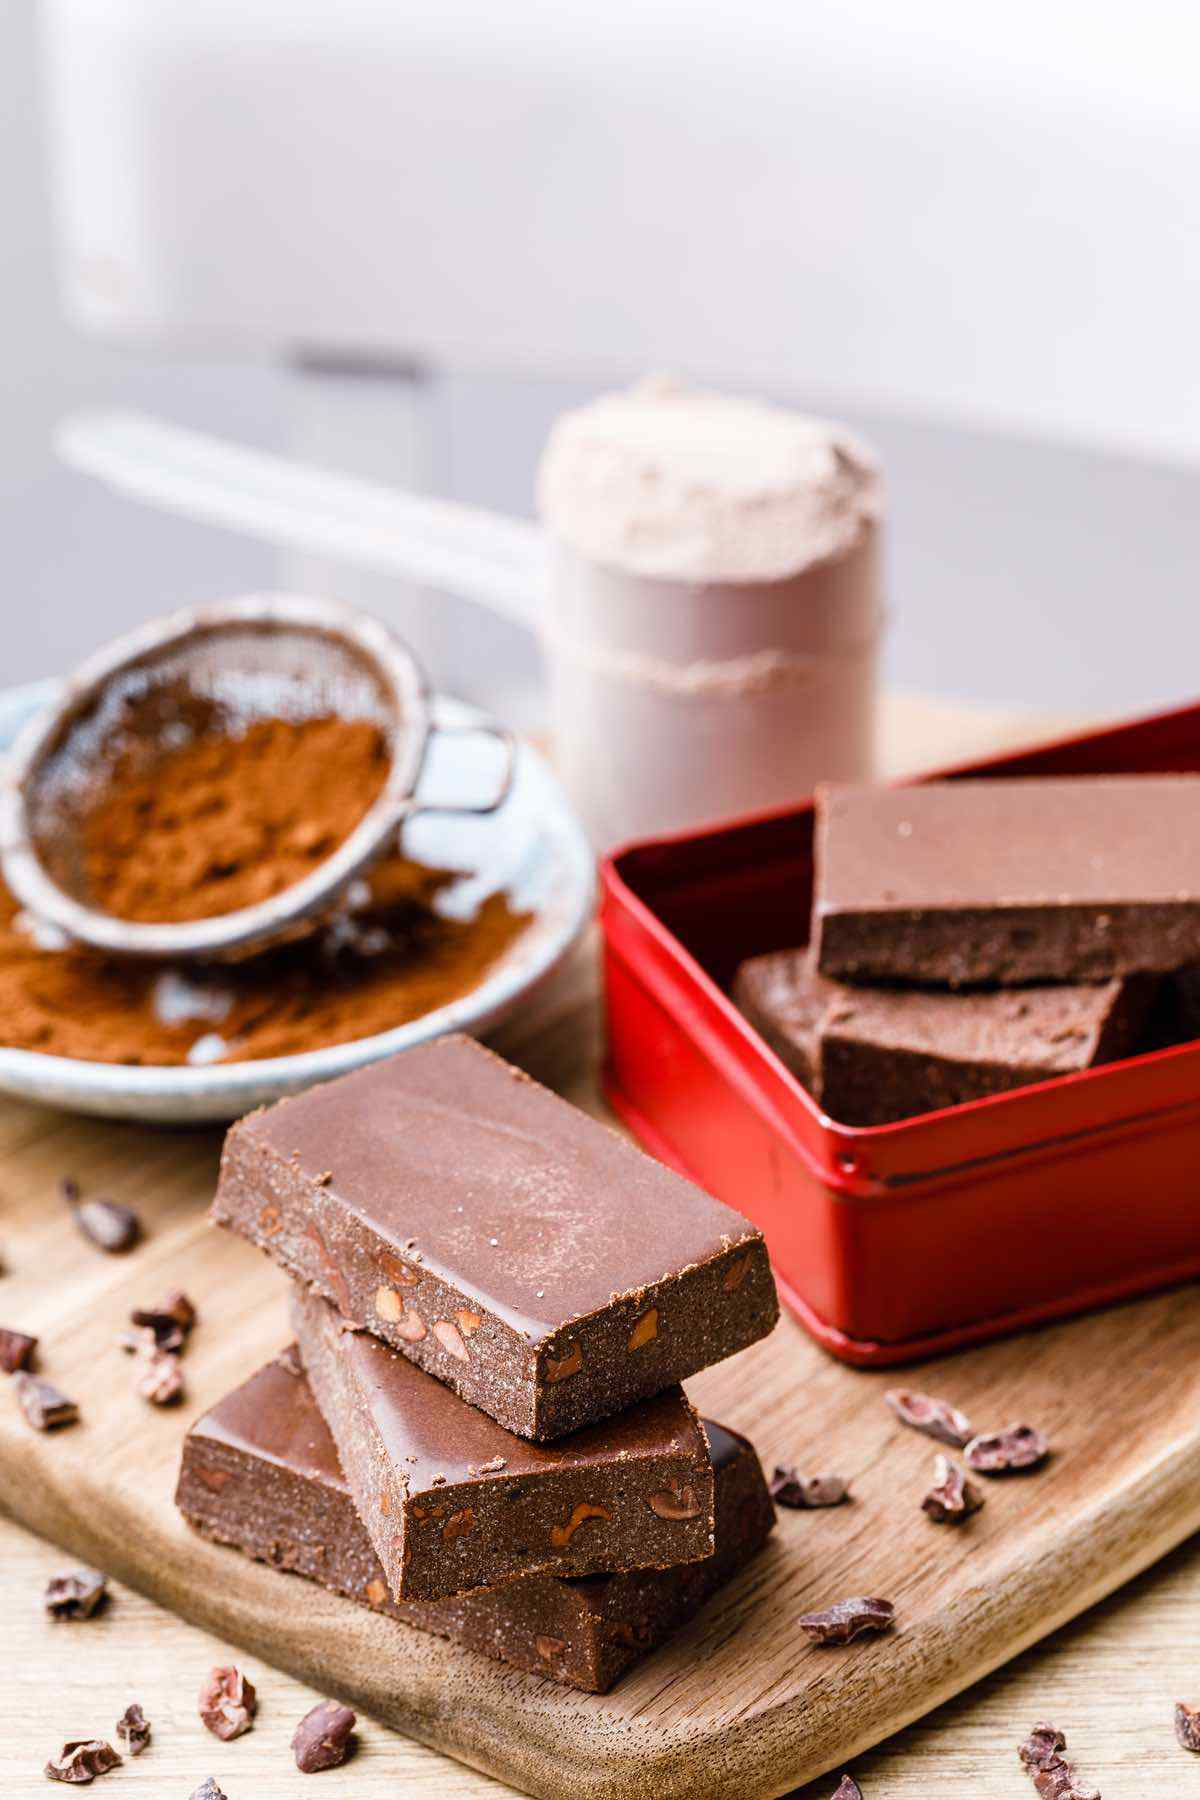 Keto Chocolate Protein Bars